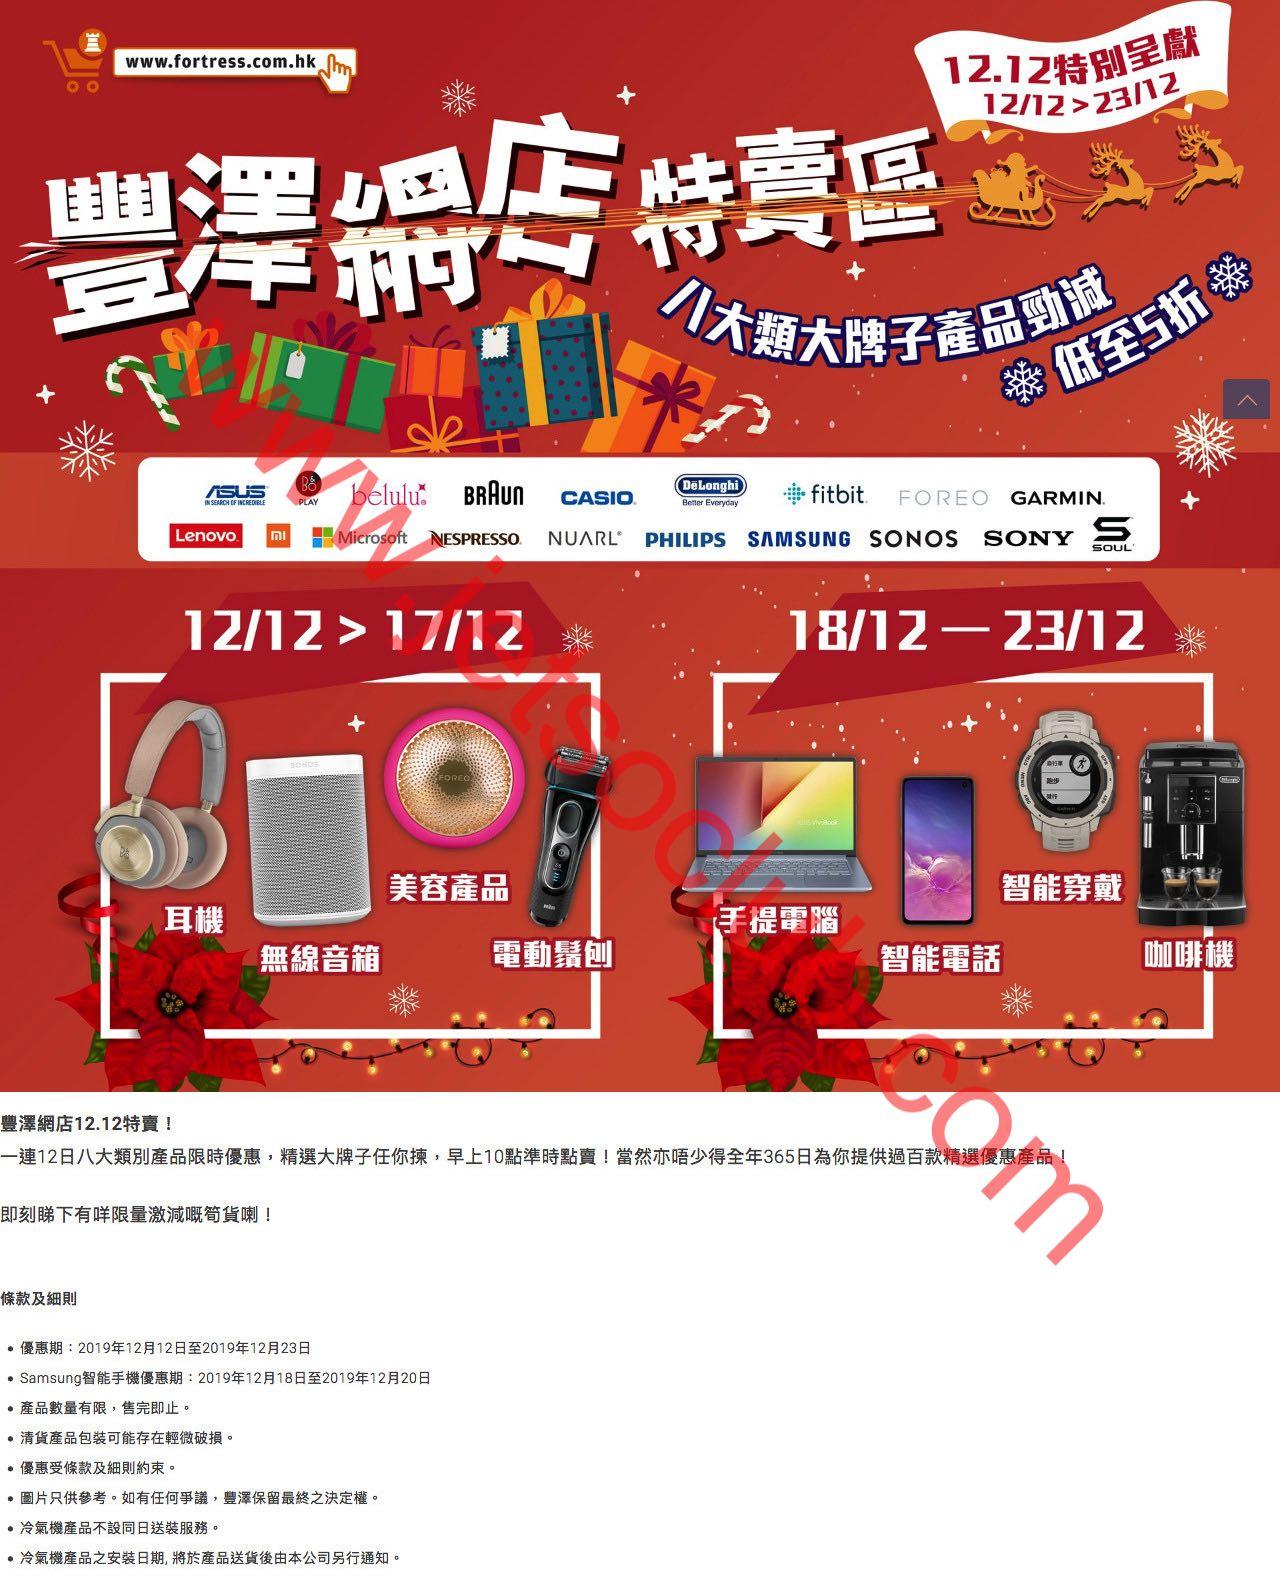 Fortress 豐澤:網店 勁減優惠 低至5折 第一擊(至17/12) ( Jetso Club 著數俱樂部 )